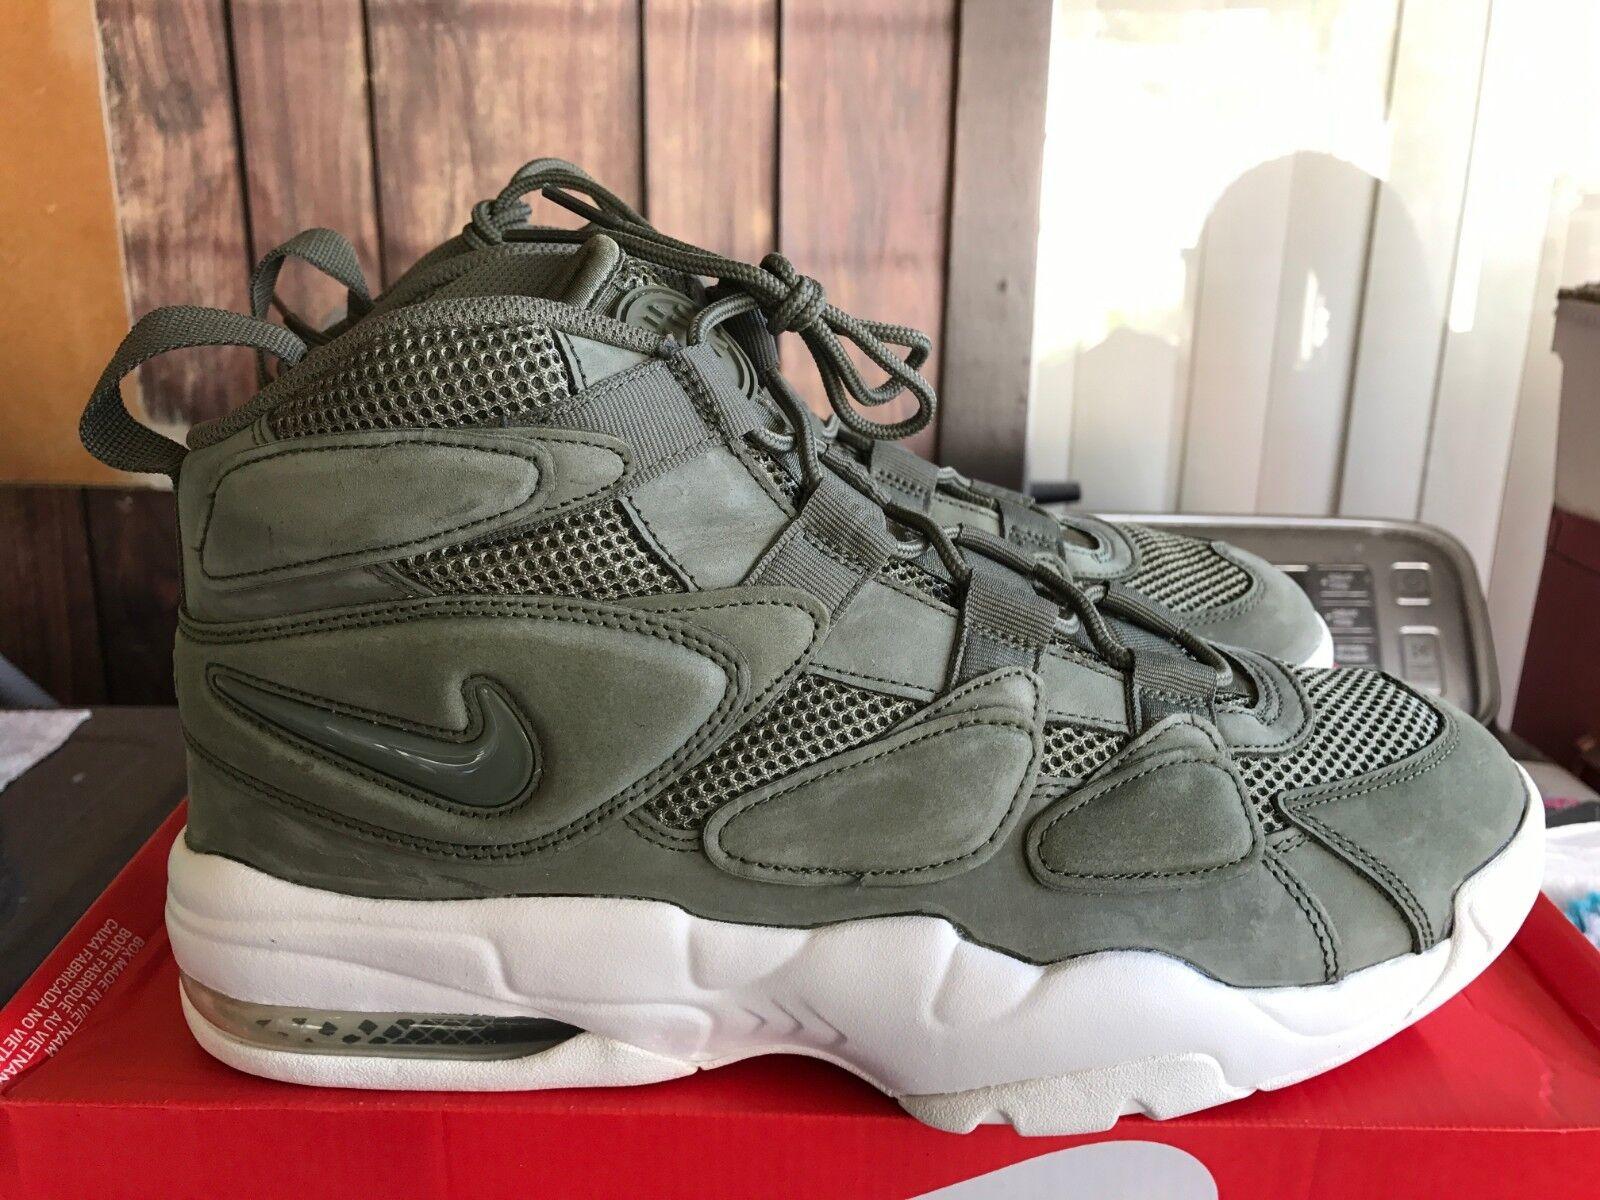 NEW Nike Air Max 2 Uptempo QS Urban Haze Sail Size 13 919831 300 Rare